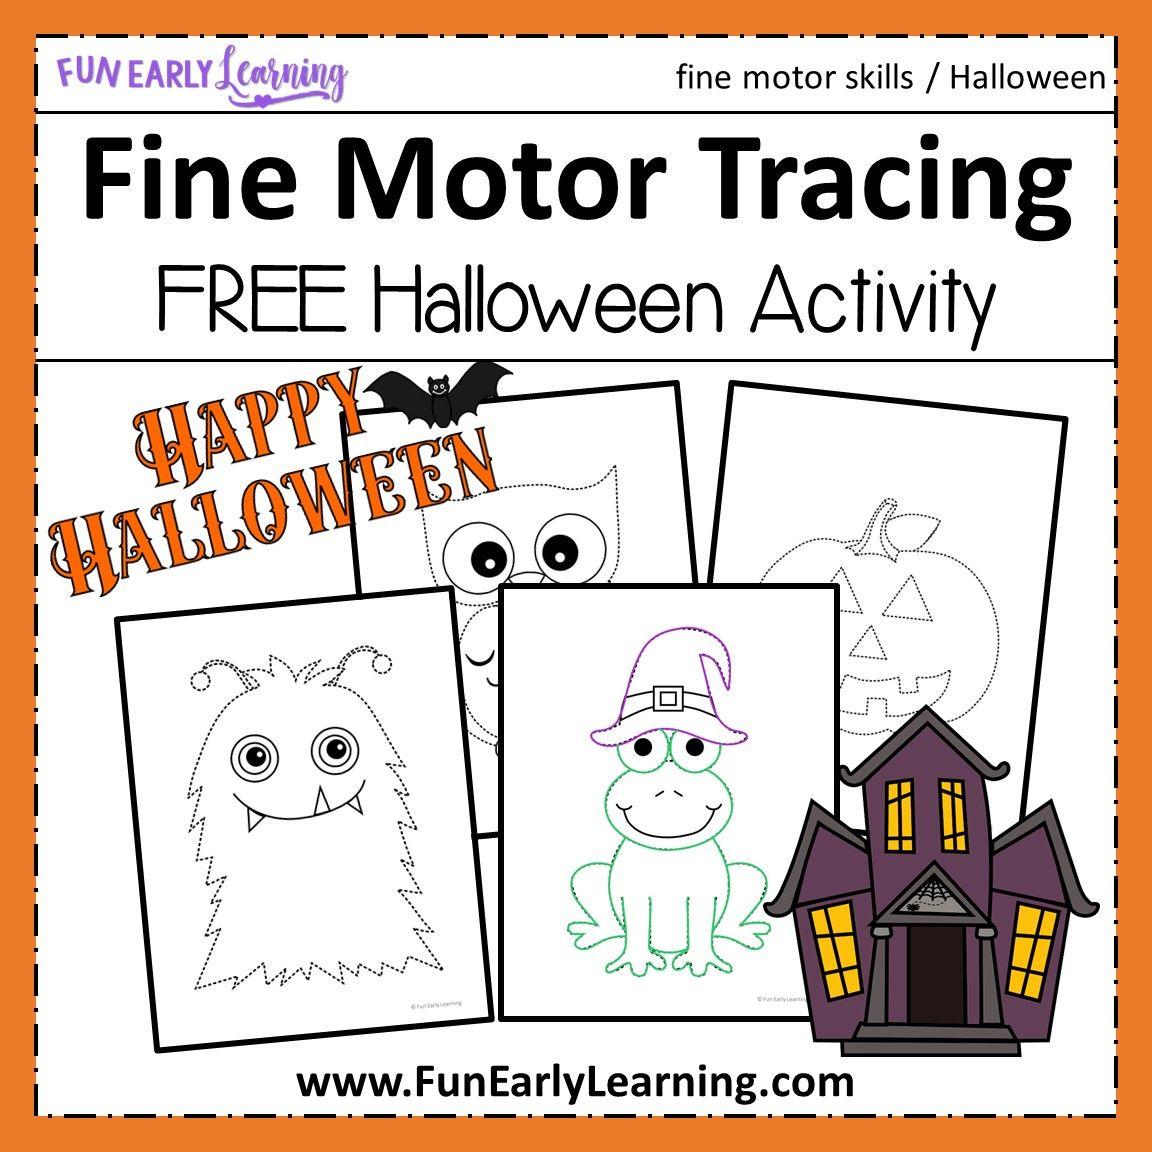 Halloween Fine Motor Tracing Free Printable